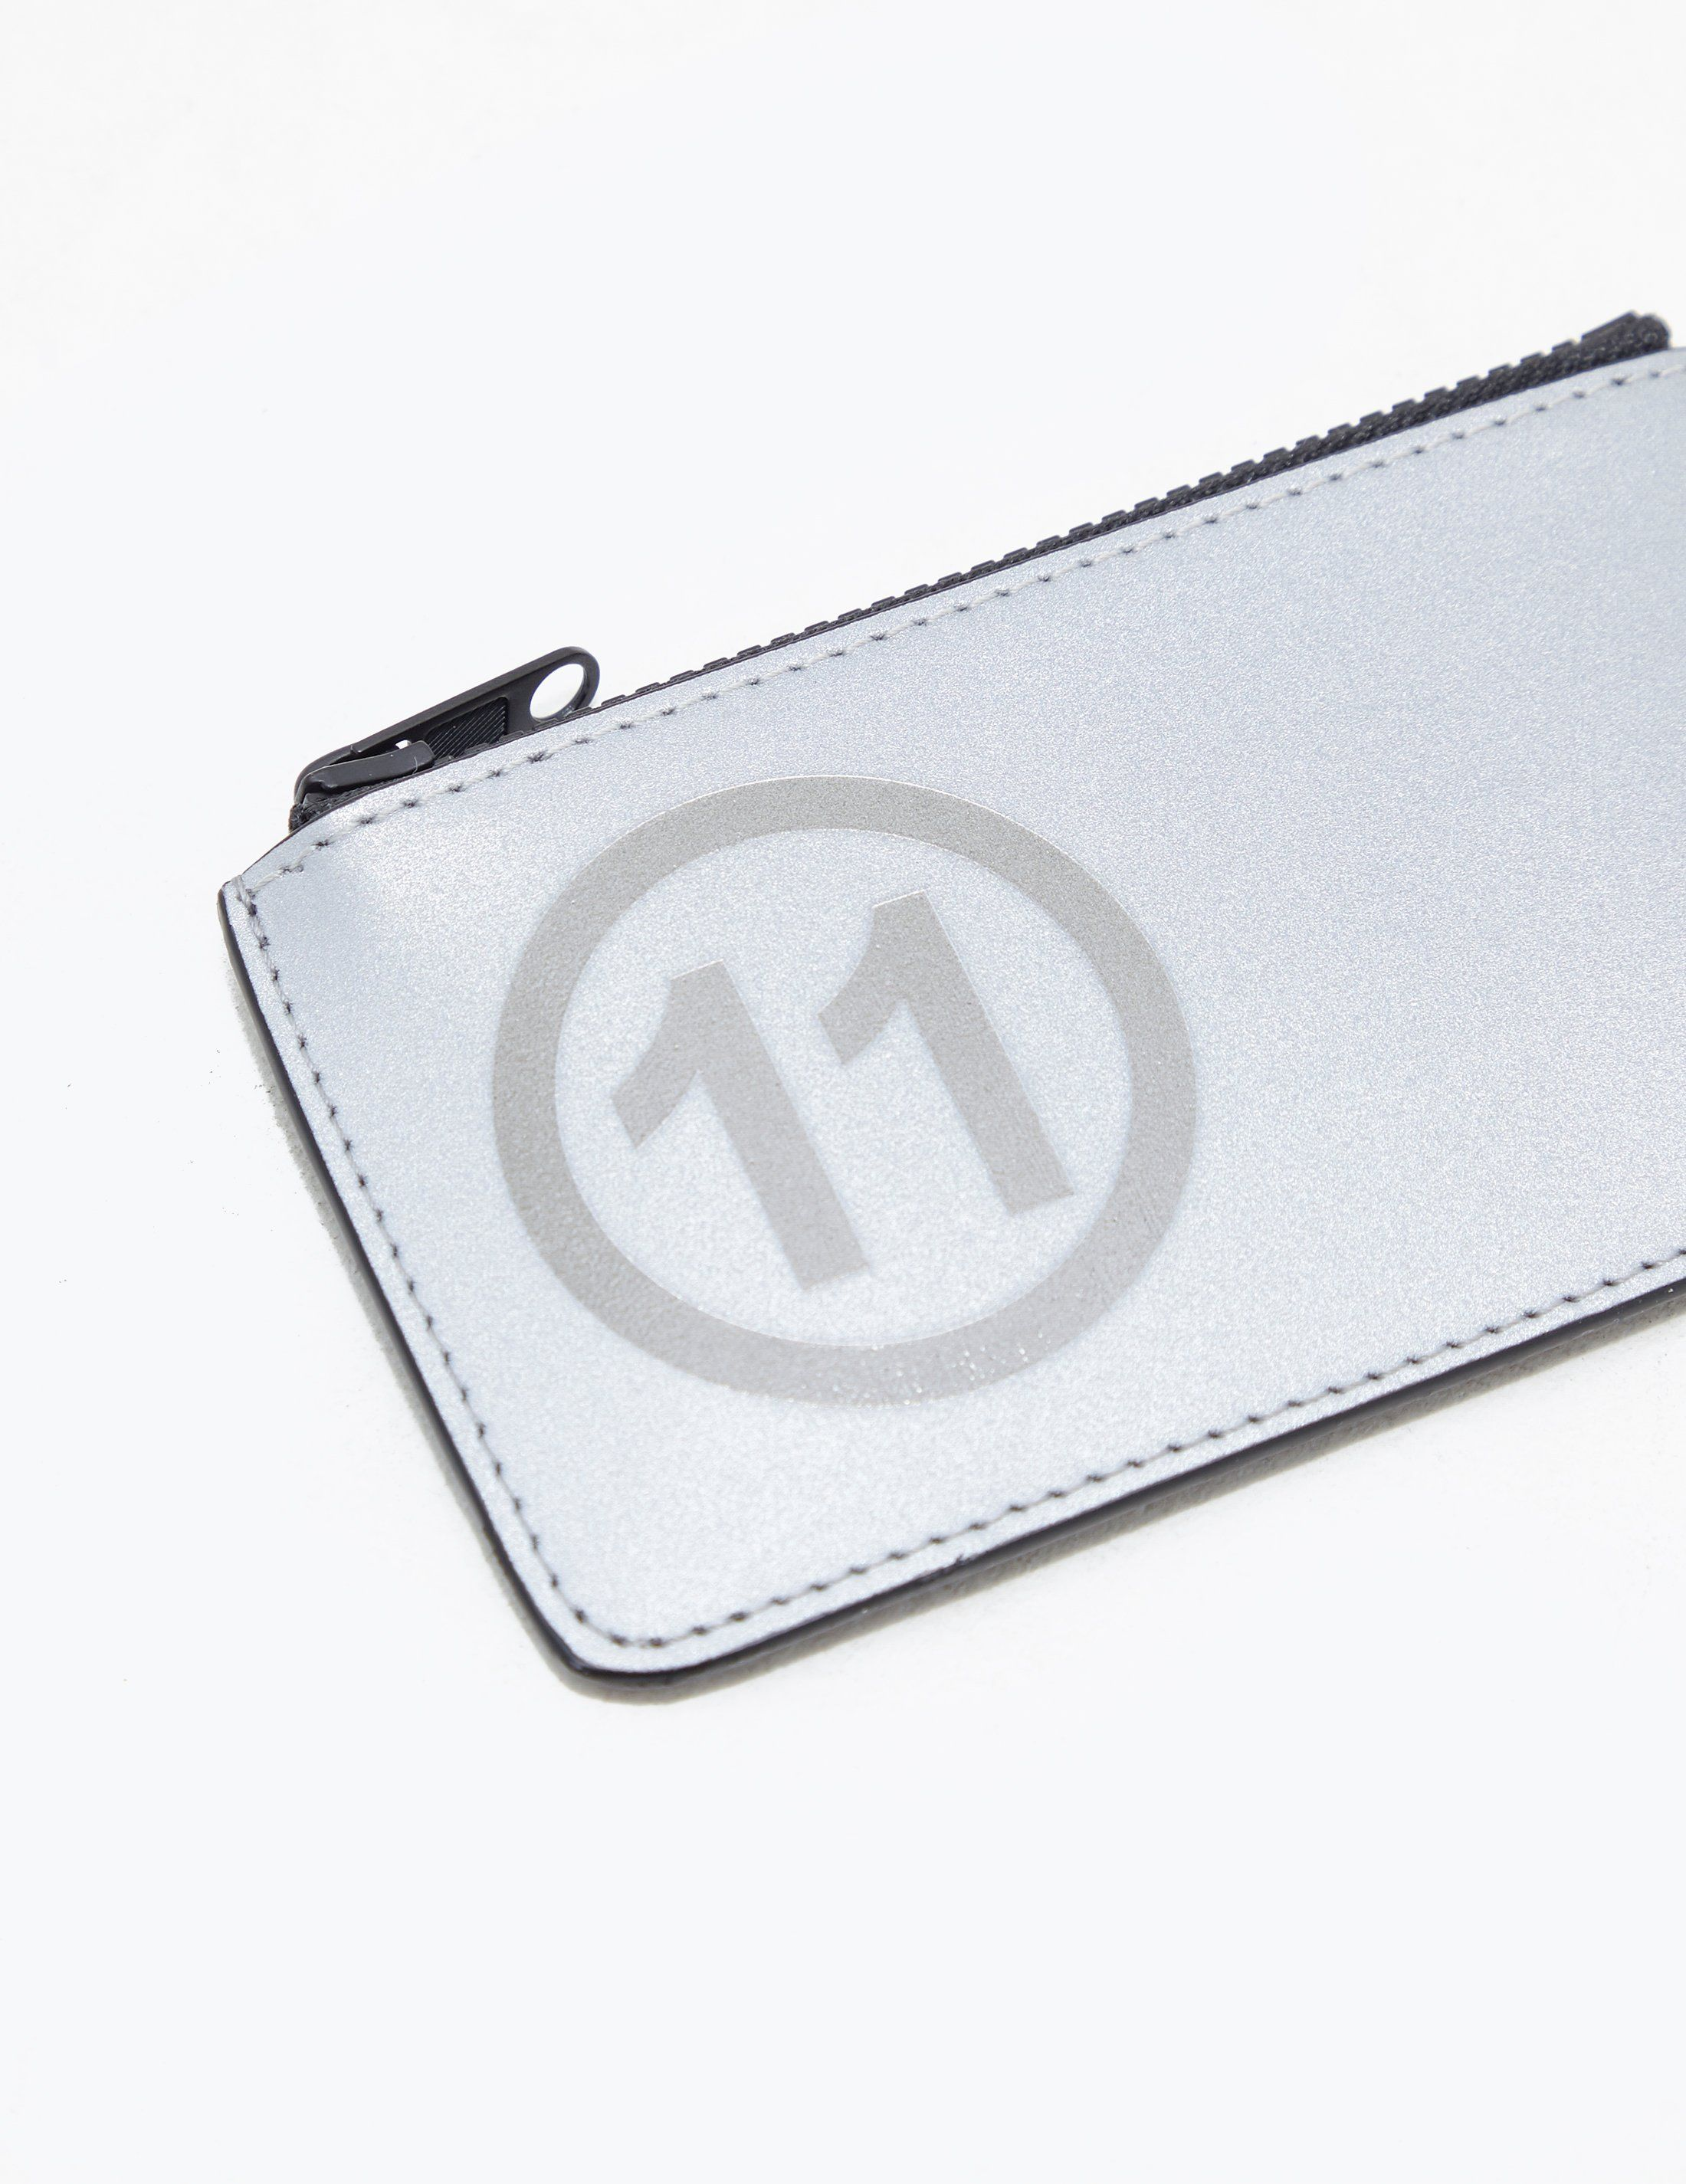 Maison Margiela Card Holder - Online Exclusive